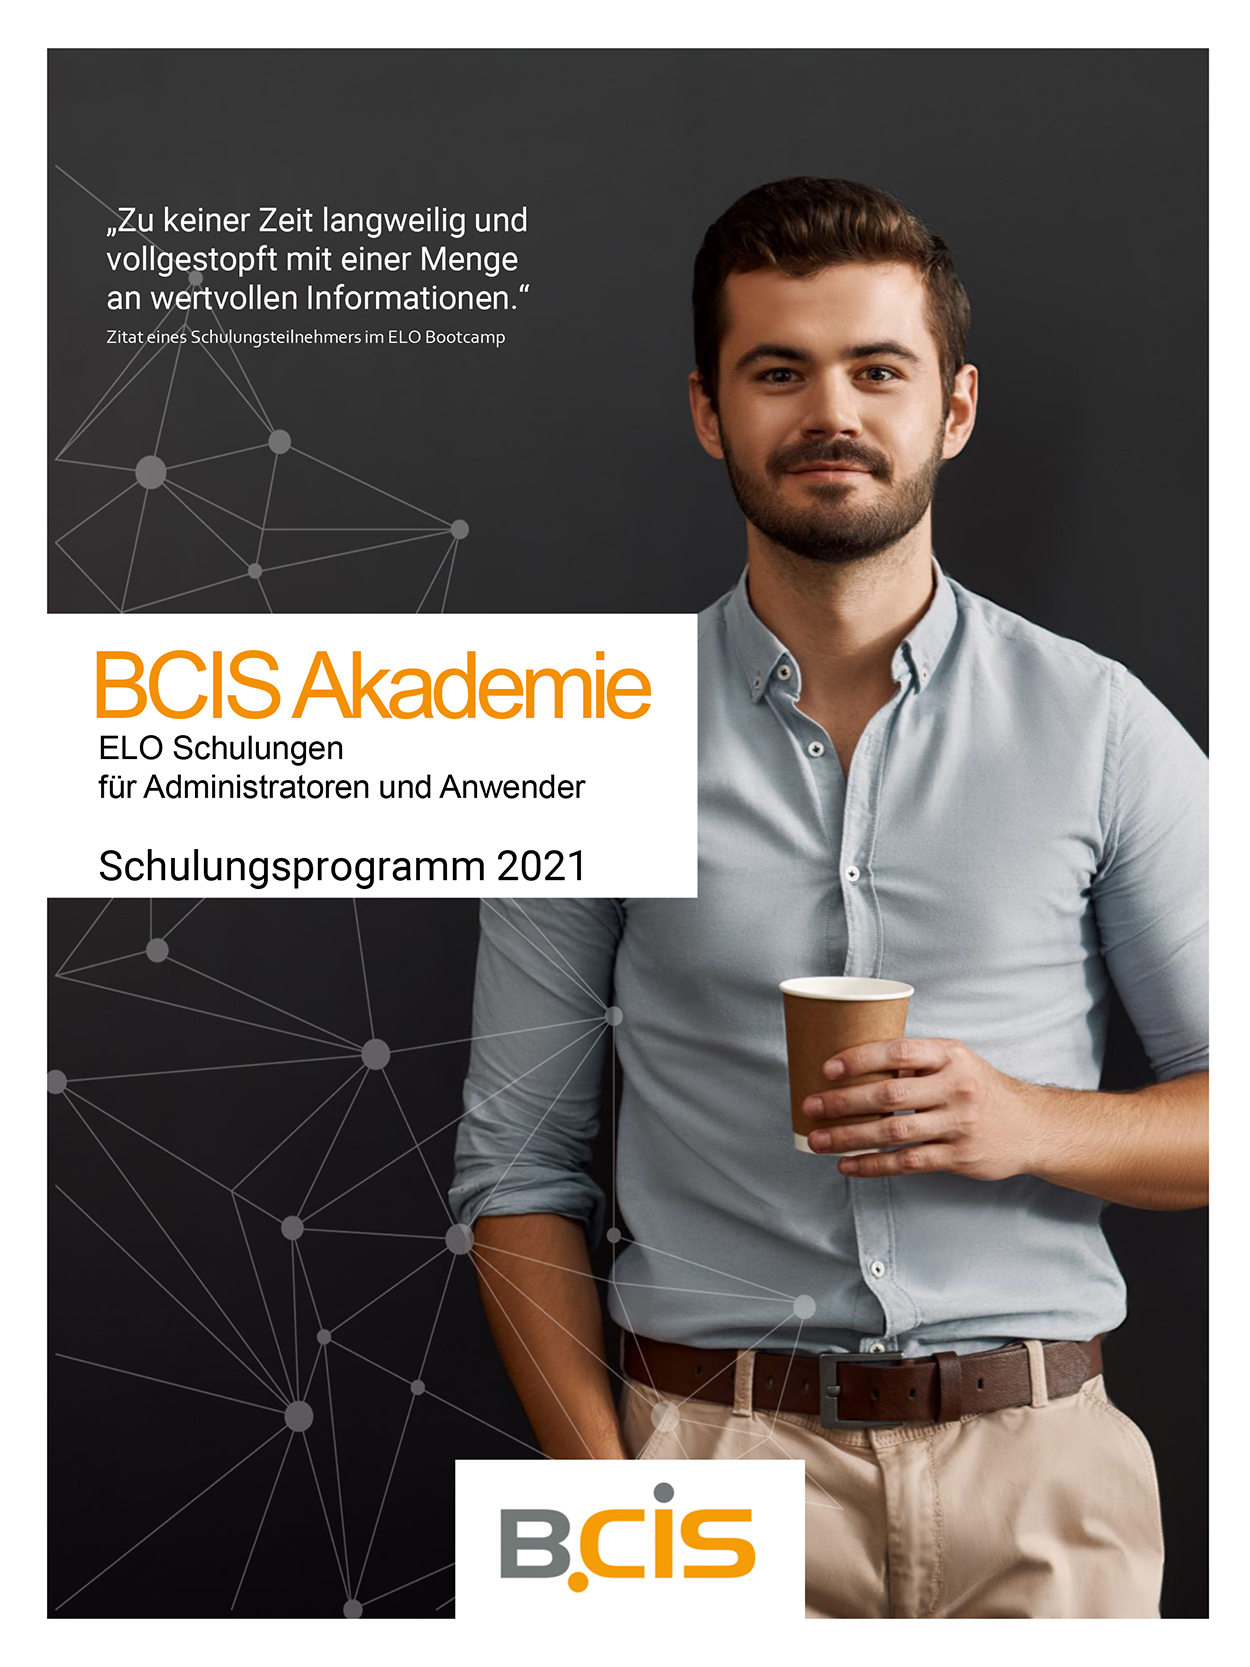 BCIS-Akademie-ELO-Schulungsprogramm-2021